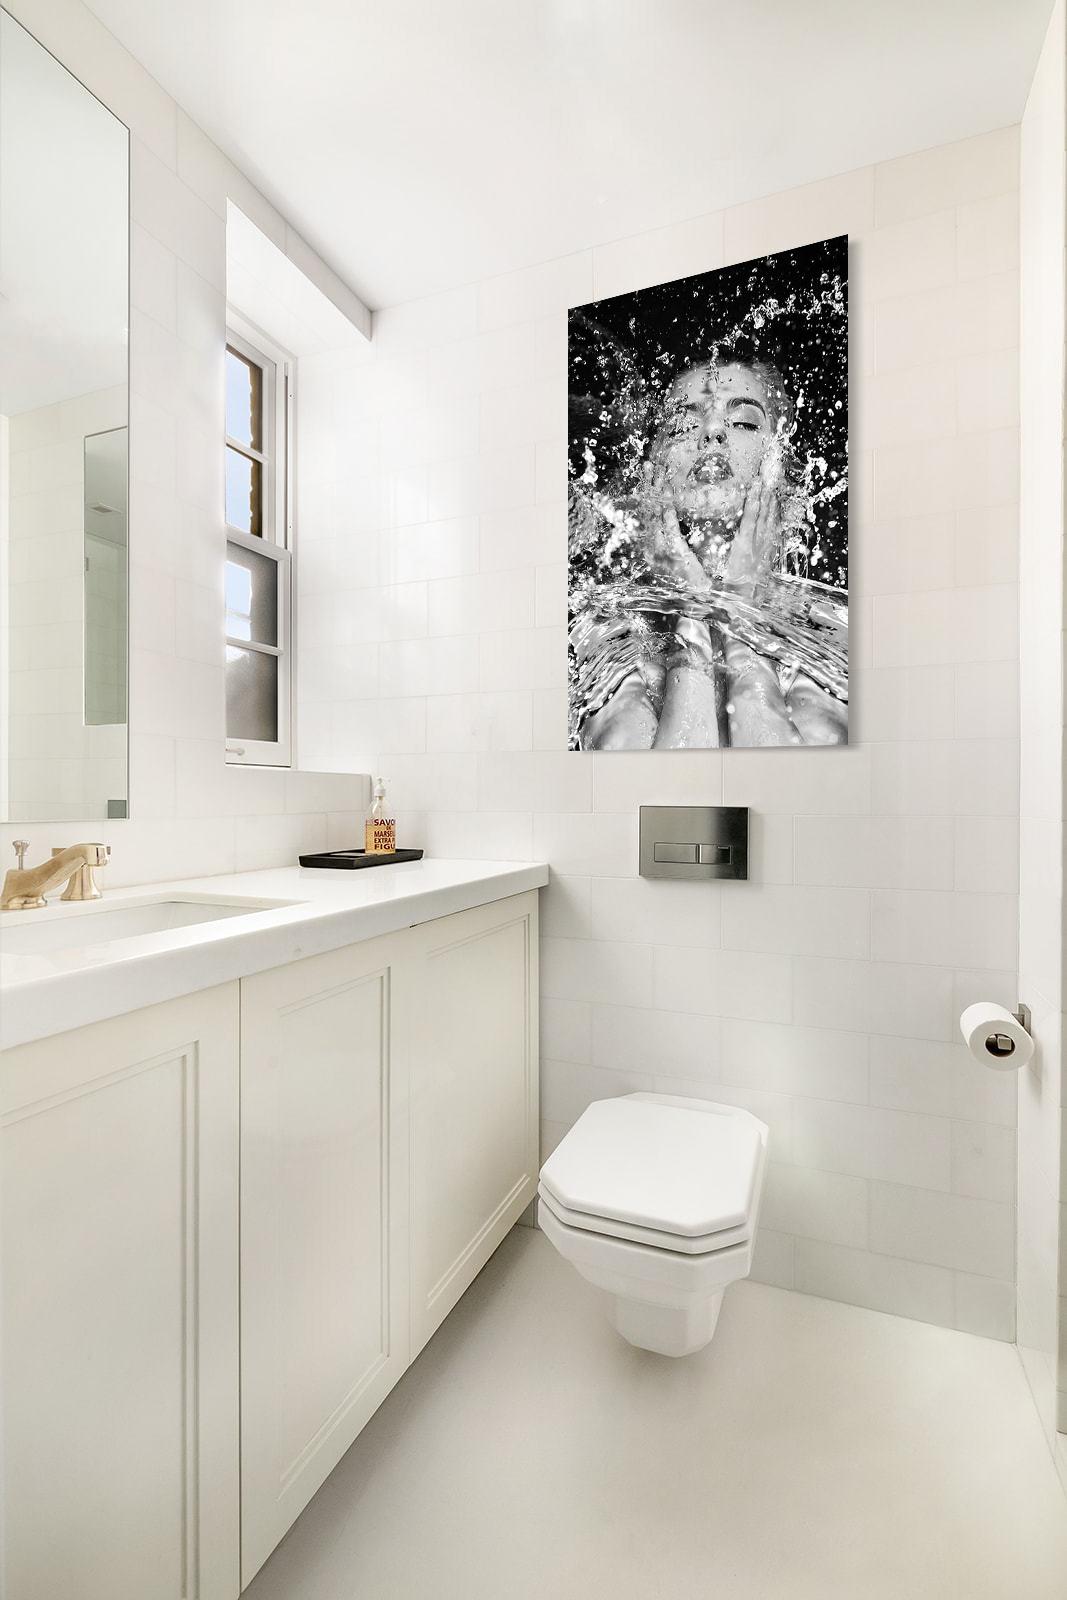 Splashing face black and white-3